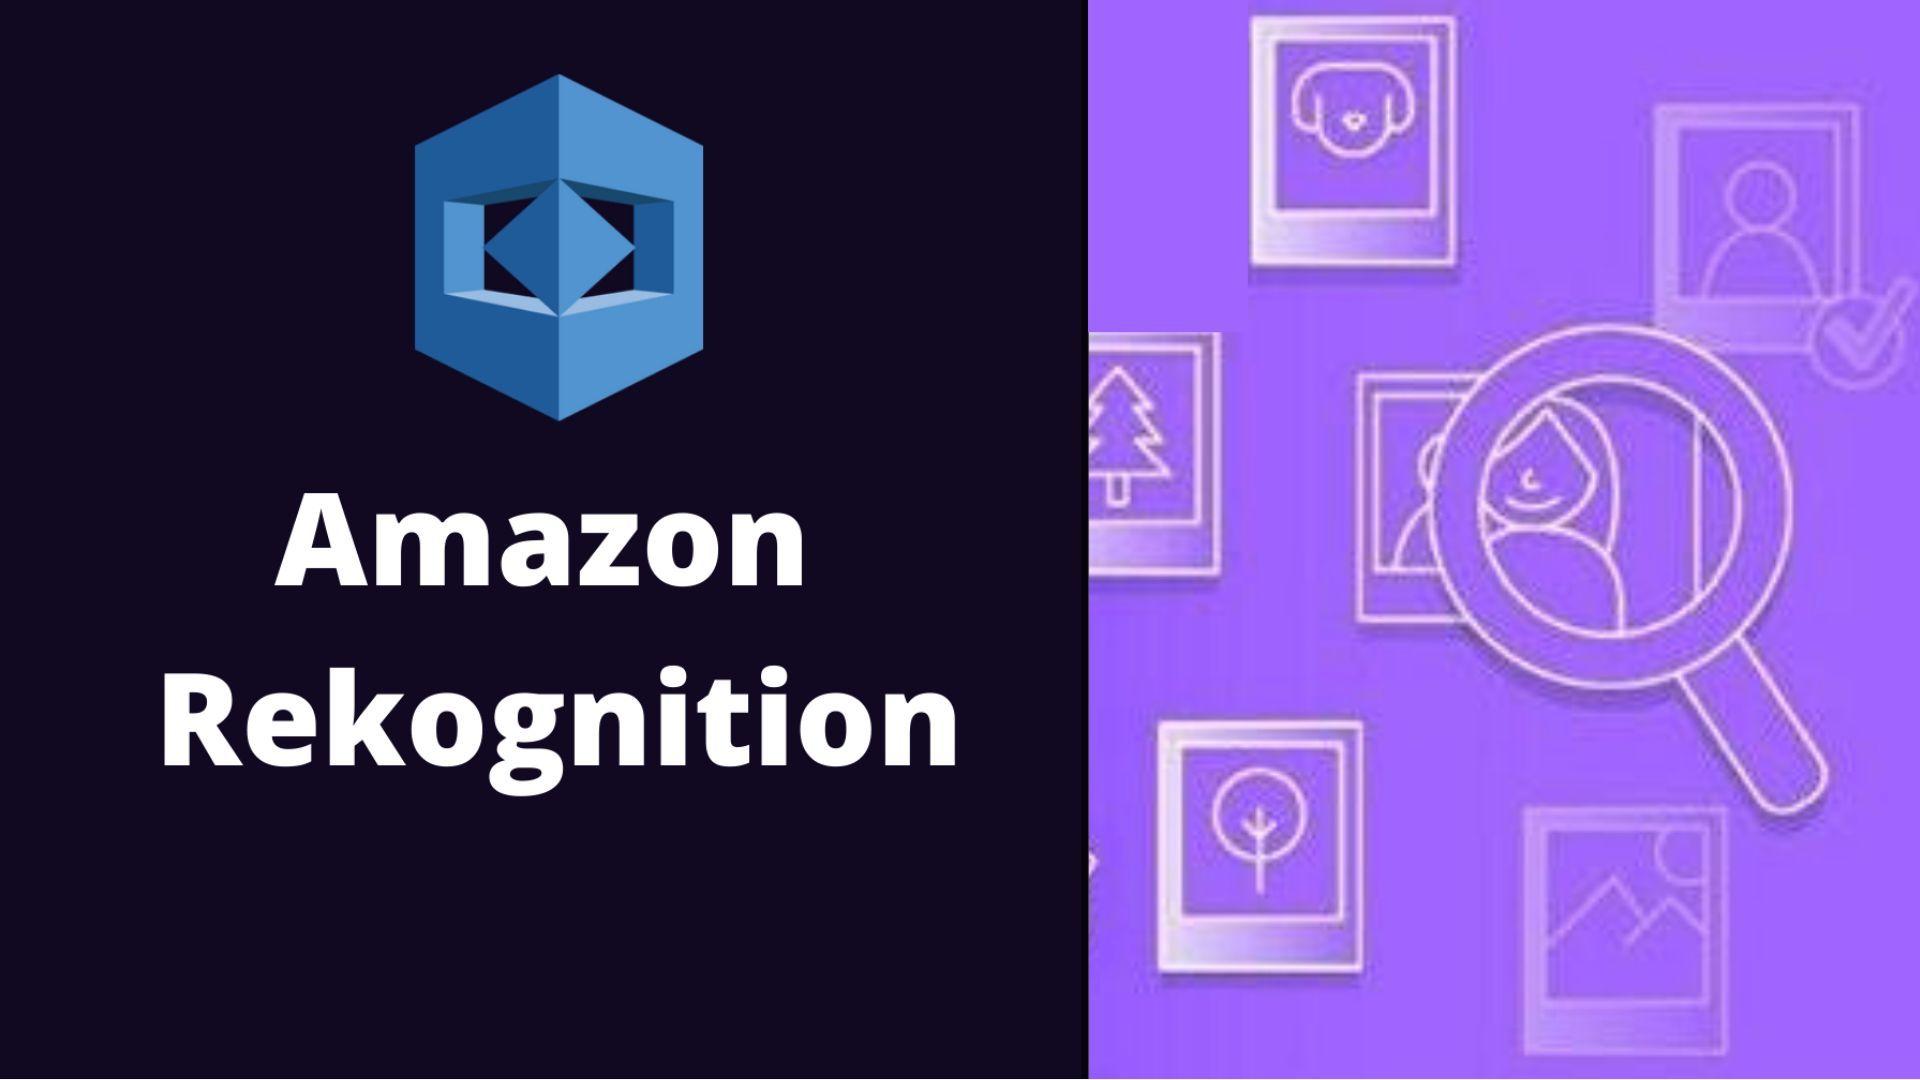 /image-analysis-using-aws-rekognition-via-lambda-function-hvq3uvy feature image